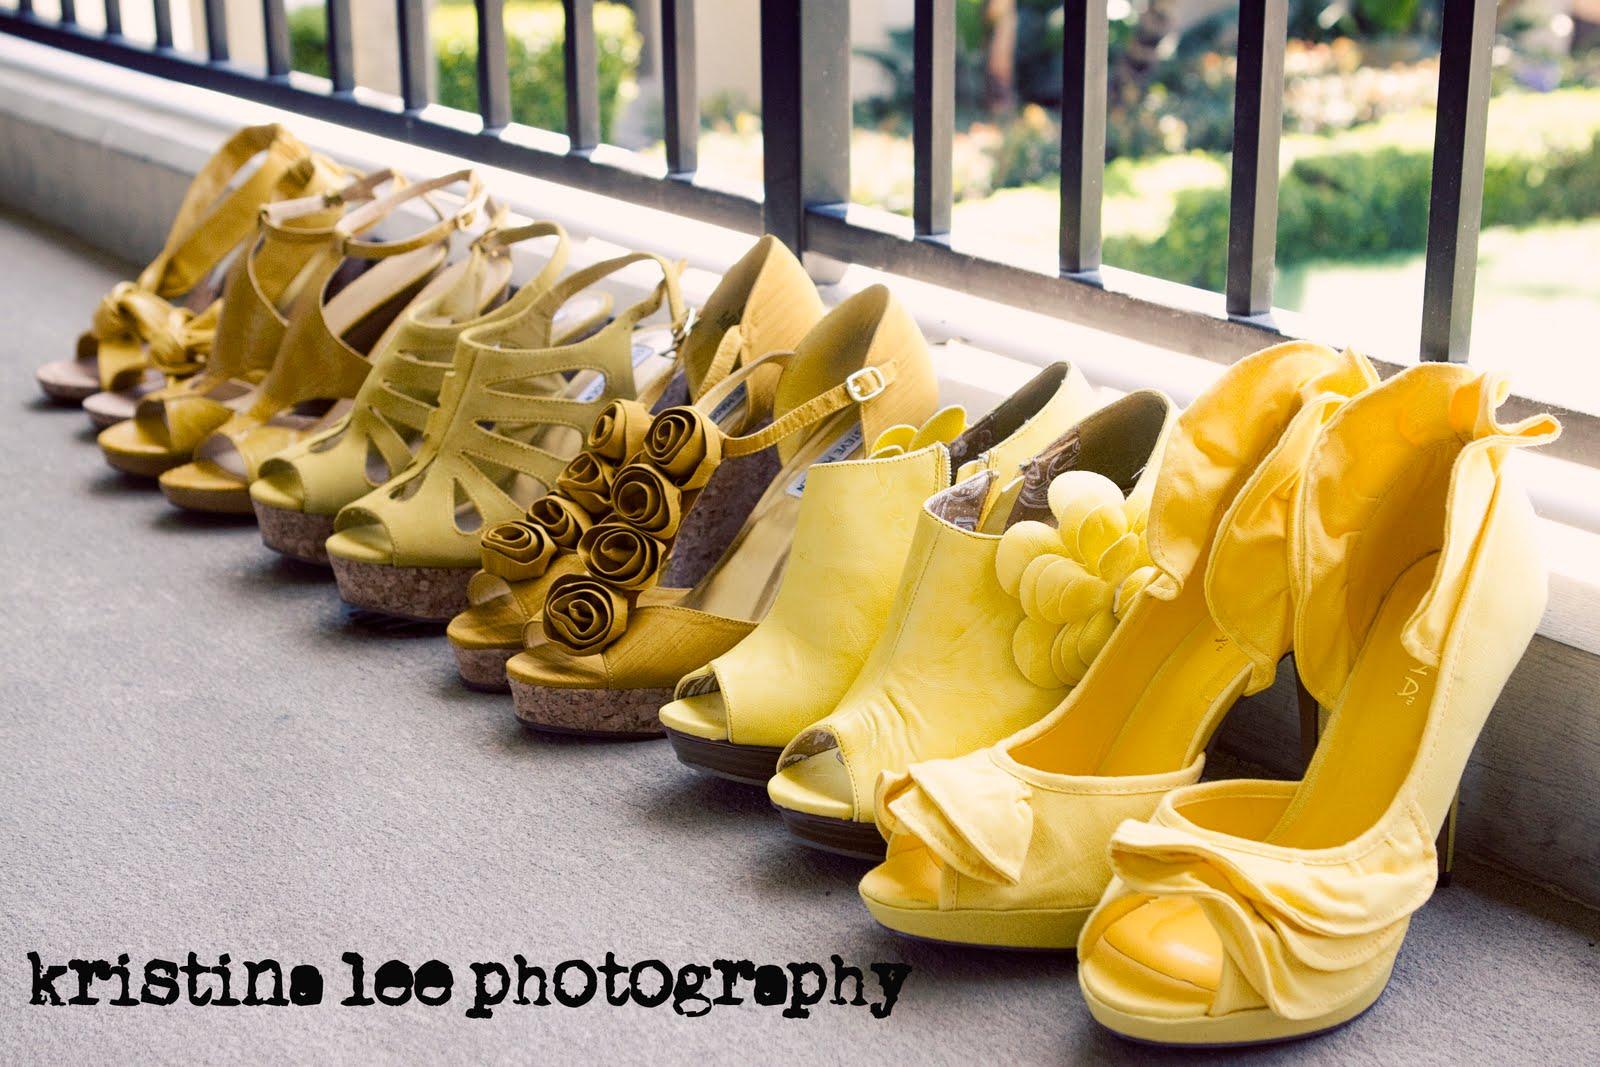 http://1.bp.blogspot.com/_uyPQ5rqsnCc/TI5qXfWPL_I/AAAAAAAABGA/BLkO76OhRSo/s1600/Red+Horse+Barn-Bell+Wedding+35.jpg